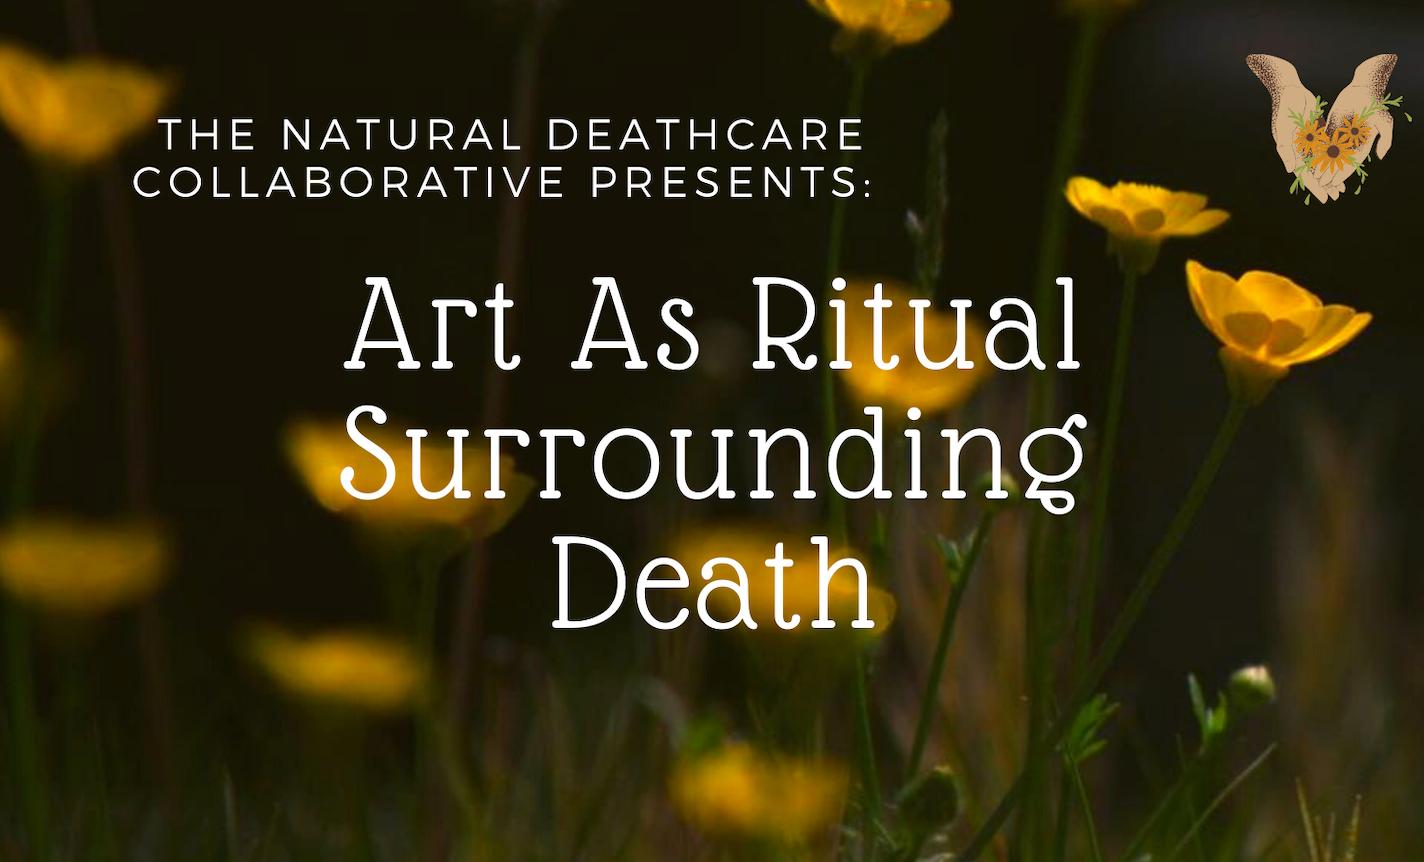 Art as Ritual Surrounding Death